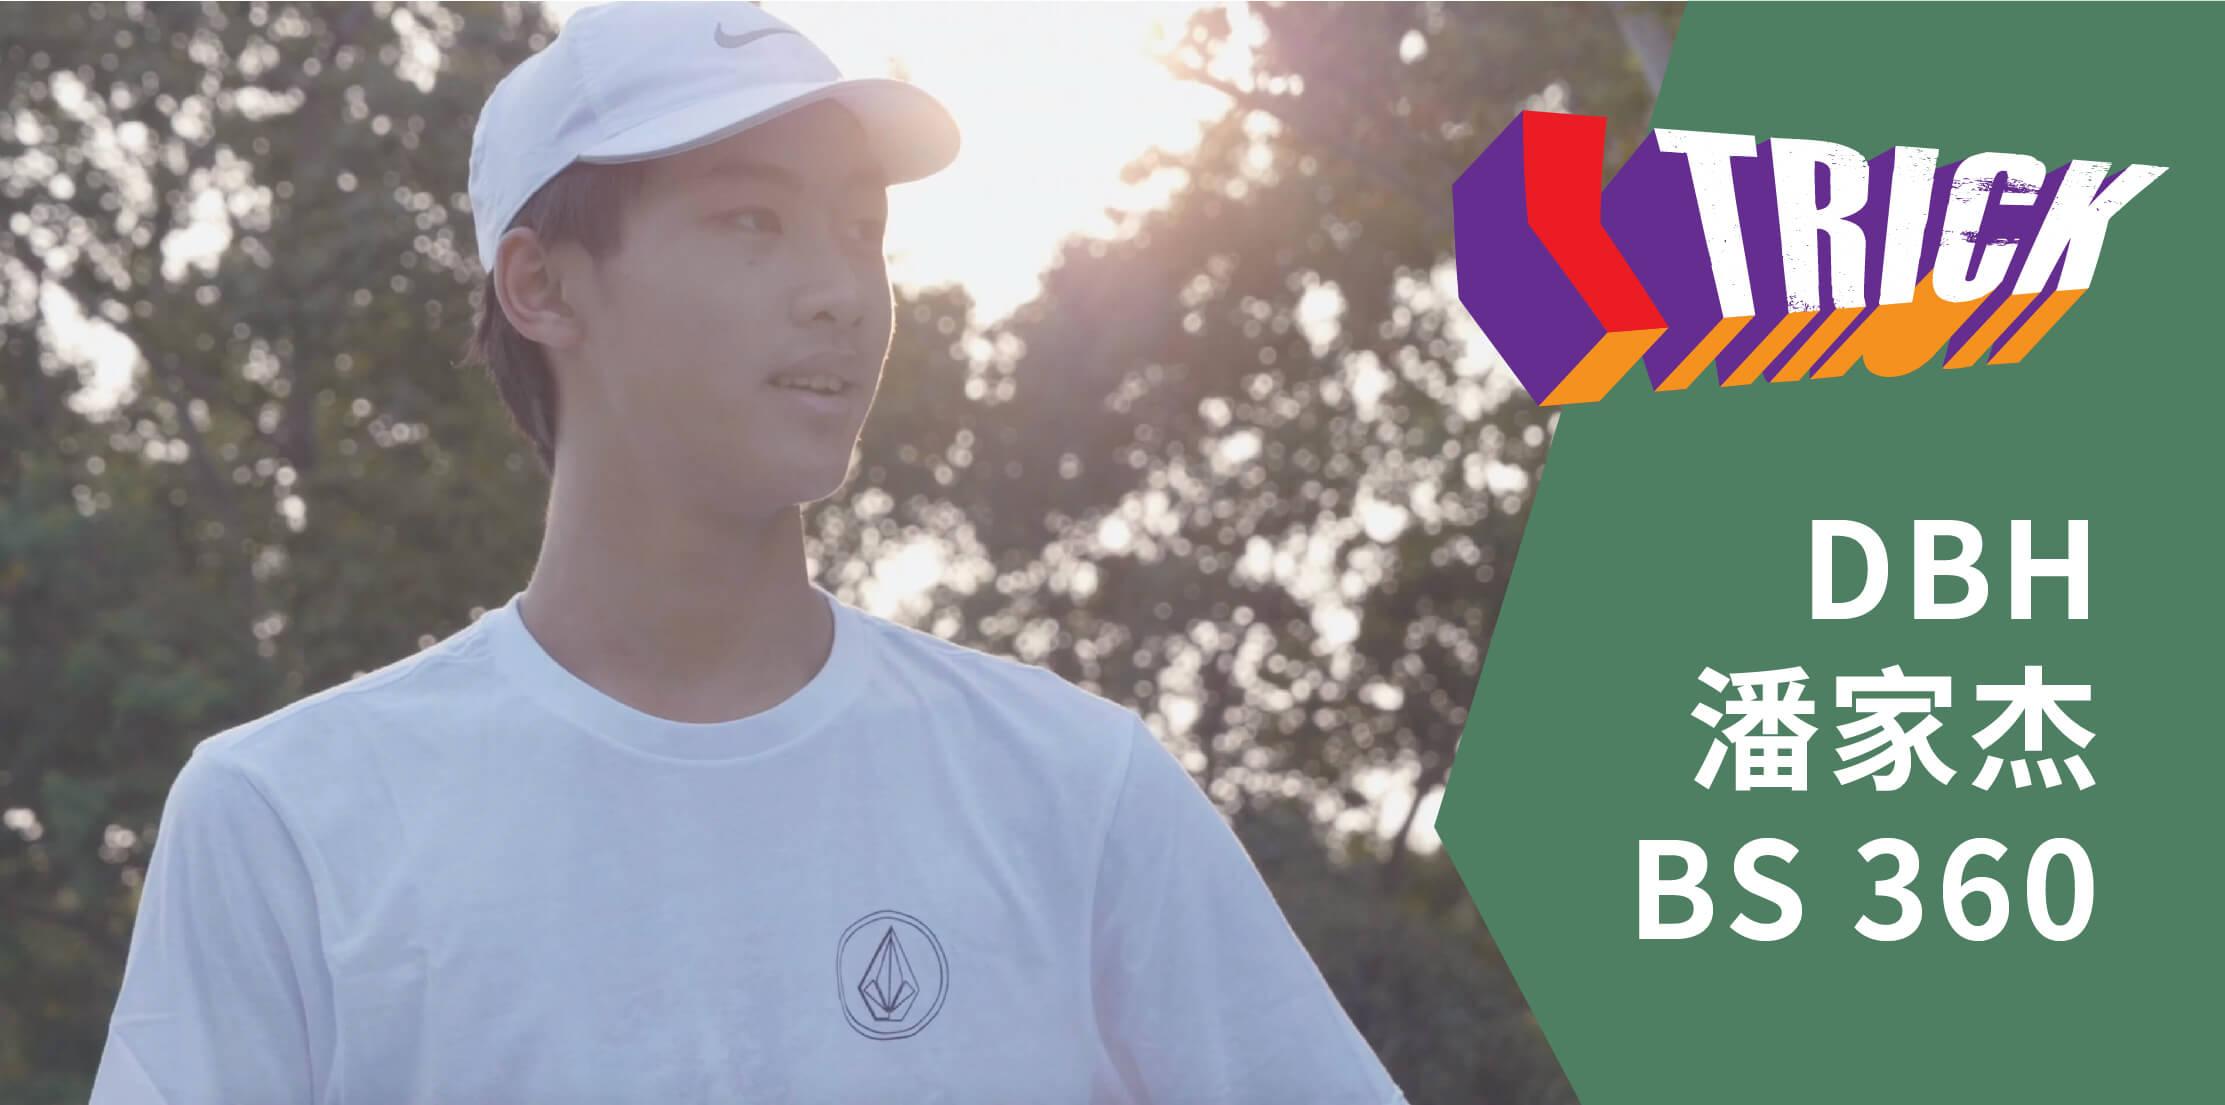 DBH 滑板教学 – 潘家杰教你做 Backside 360